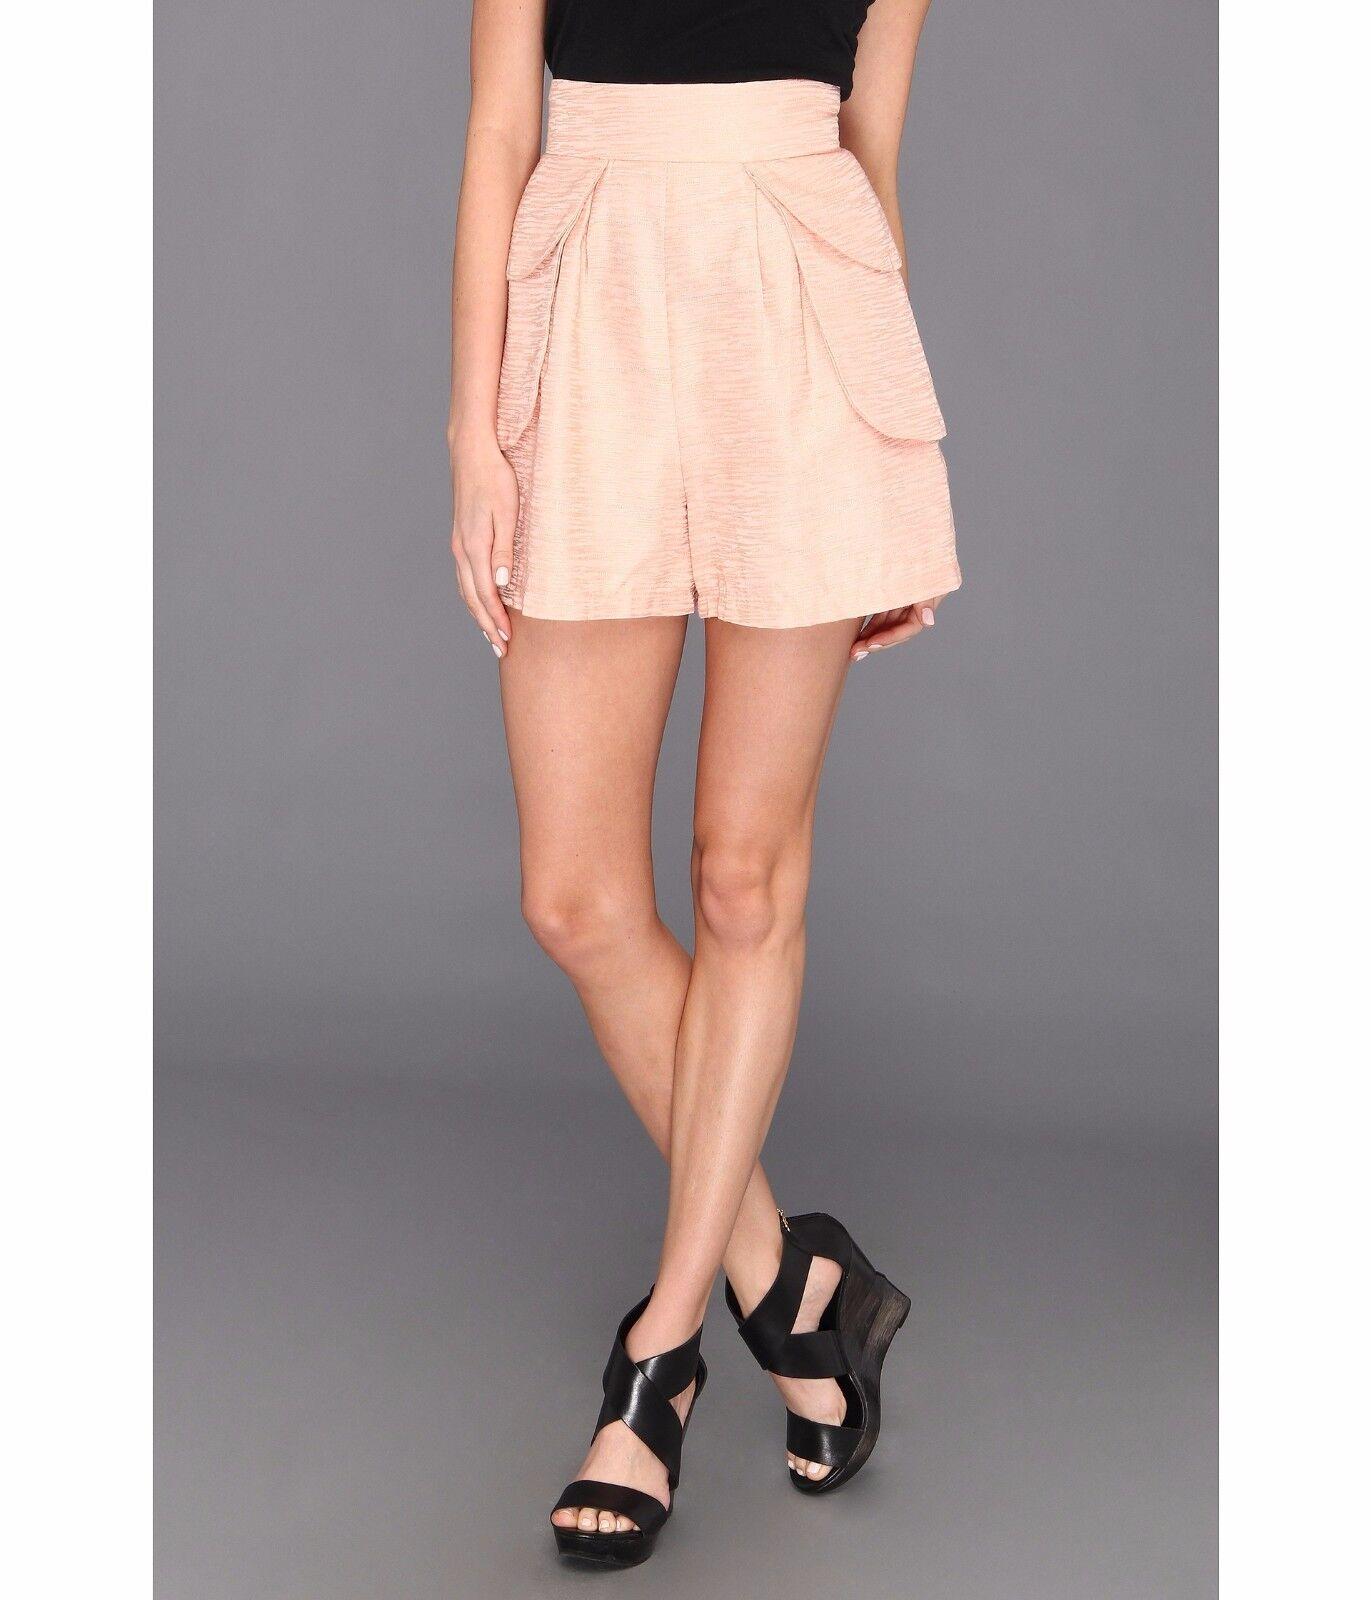 Lisa Taranto Lyla Dress Shorts Pink Women's 6